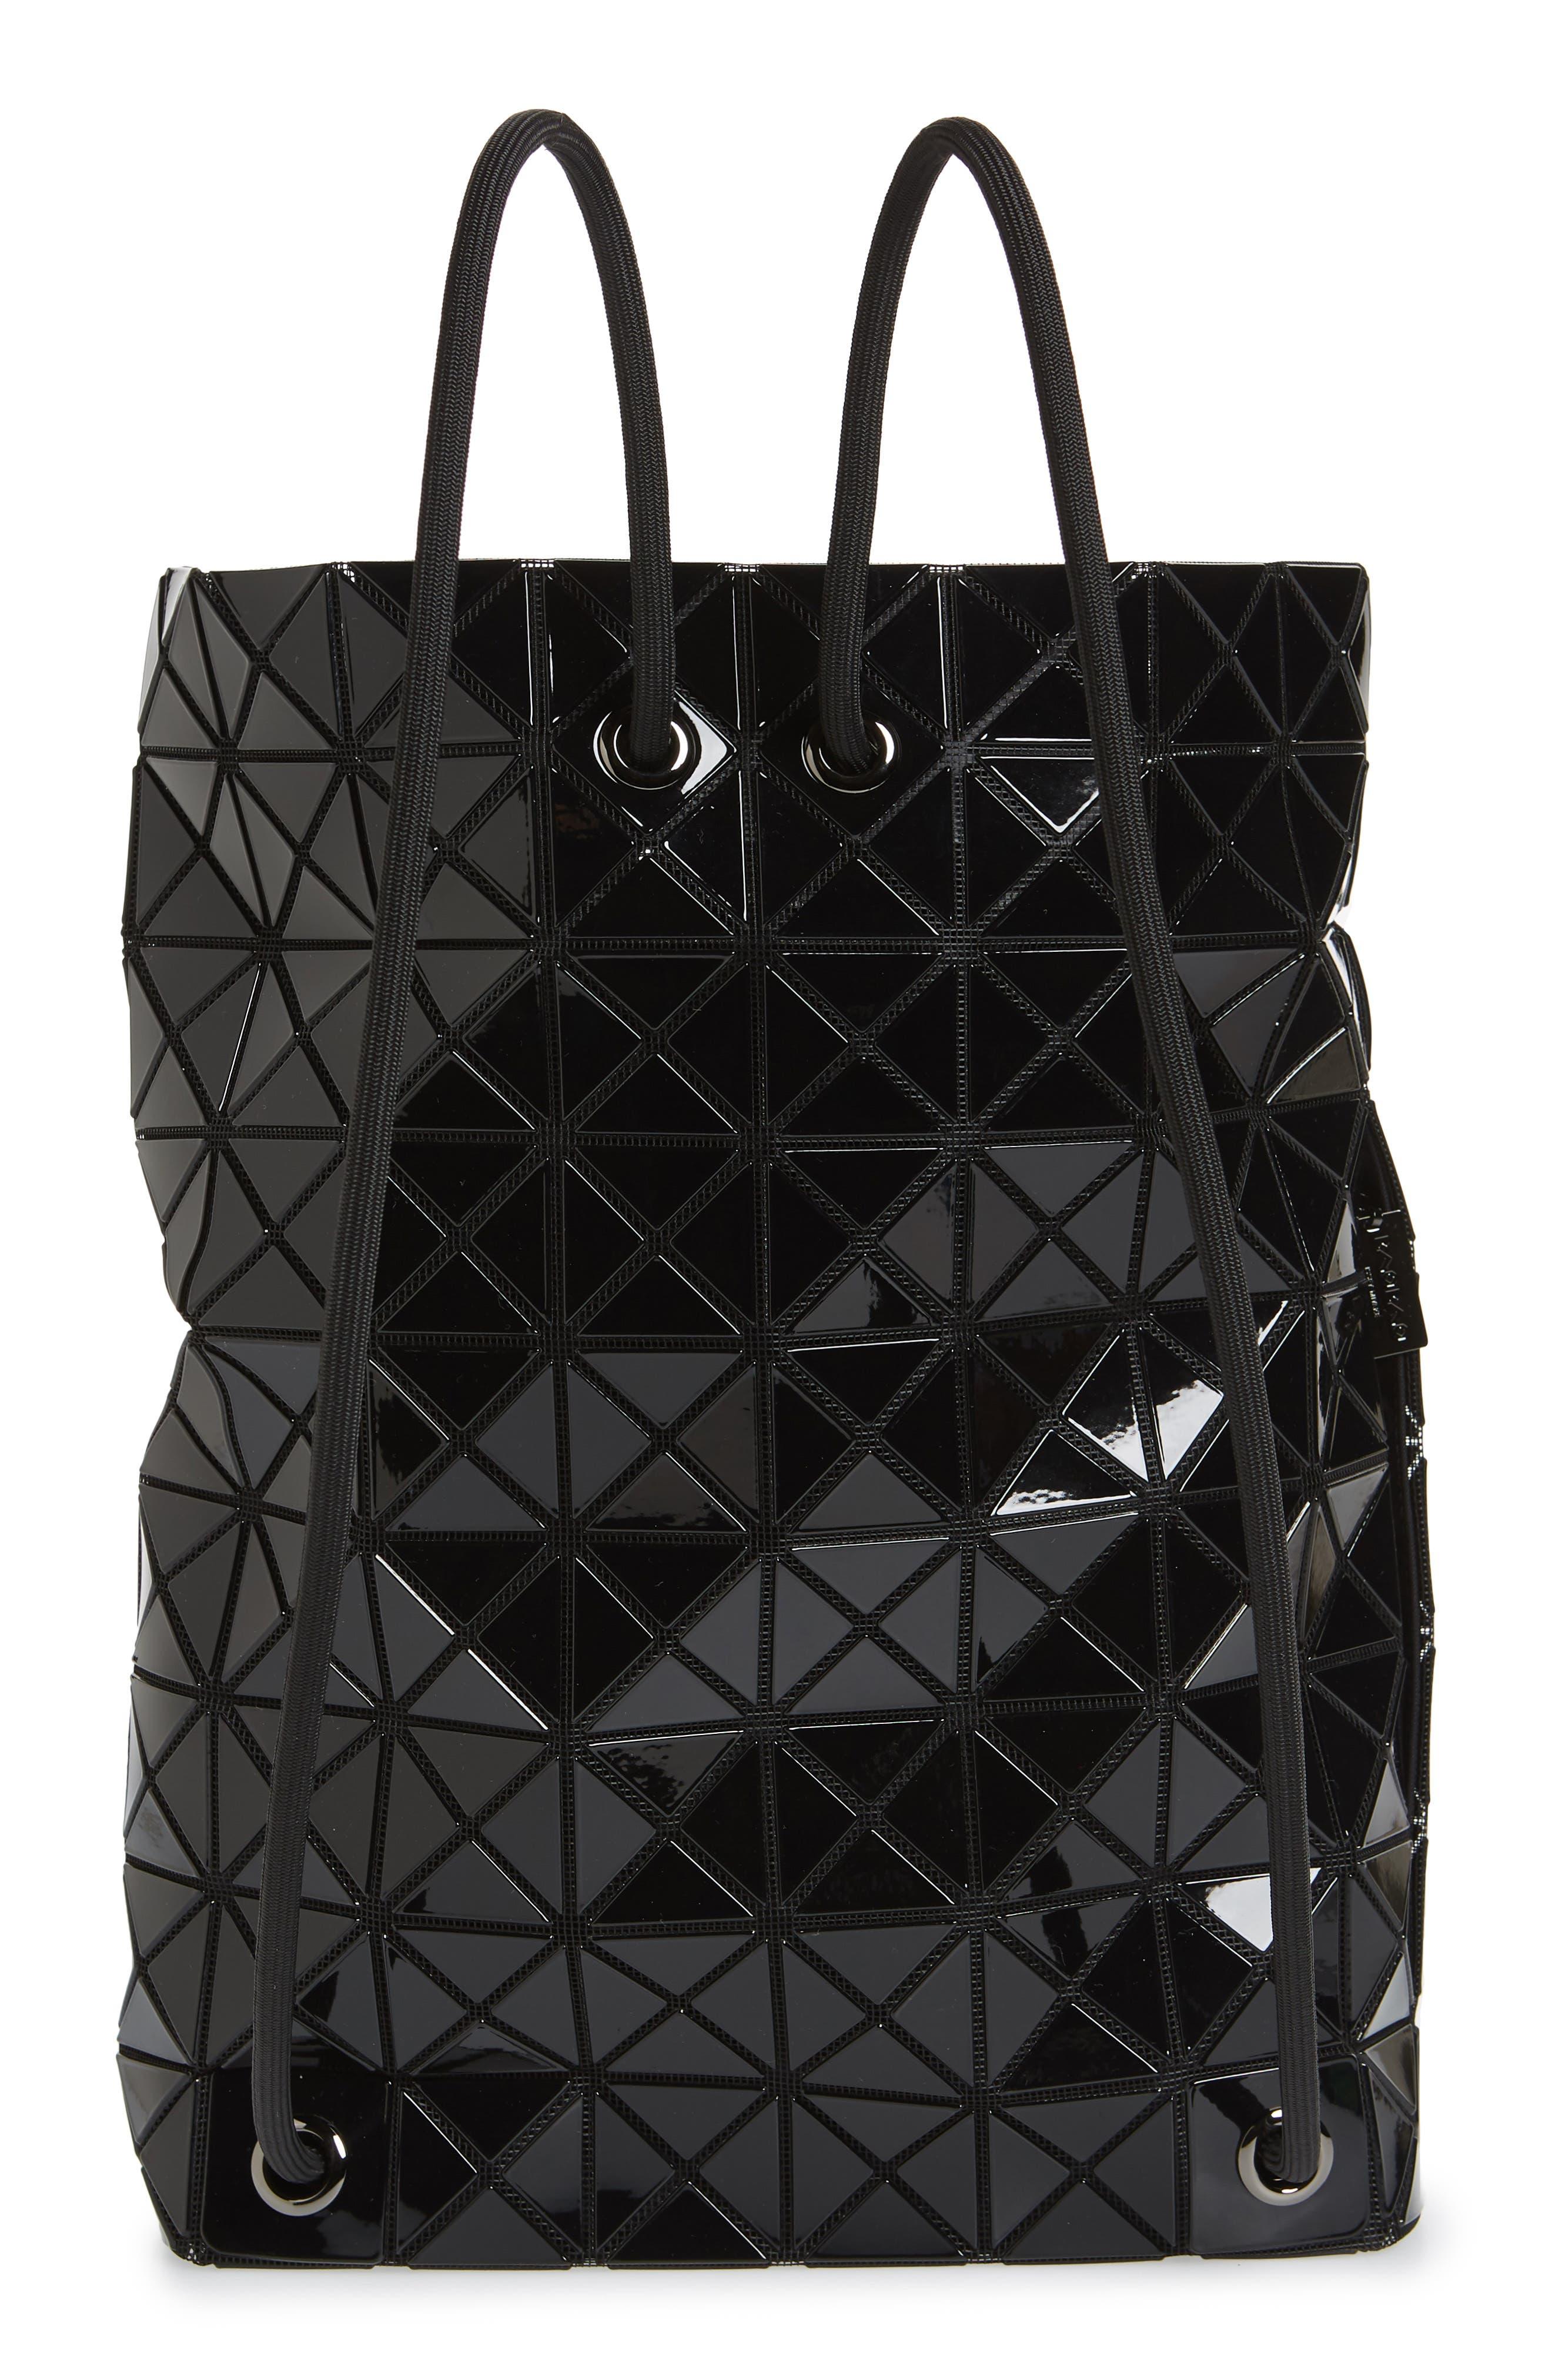 BAO BAO ISSEY MIYAKE, Wring Flat Backpack, Alternate thumbnail 4, color, BLACK